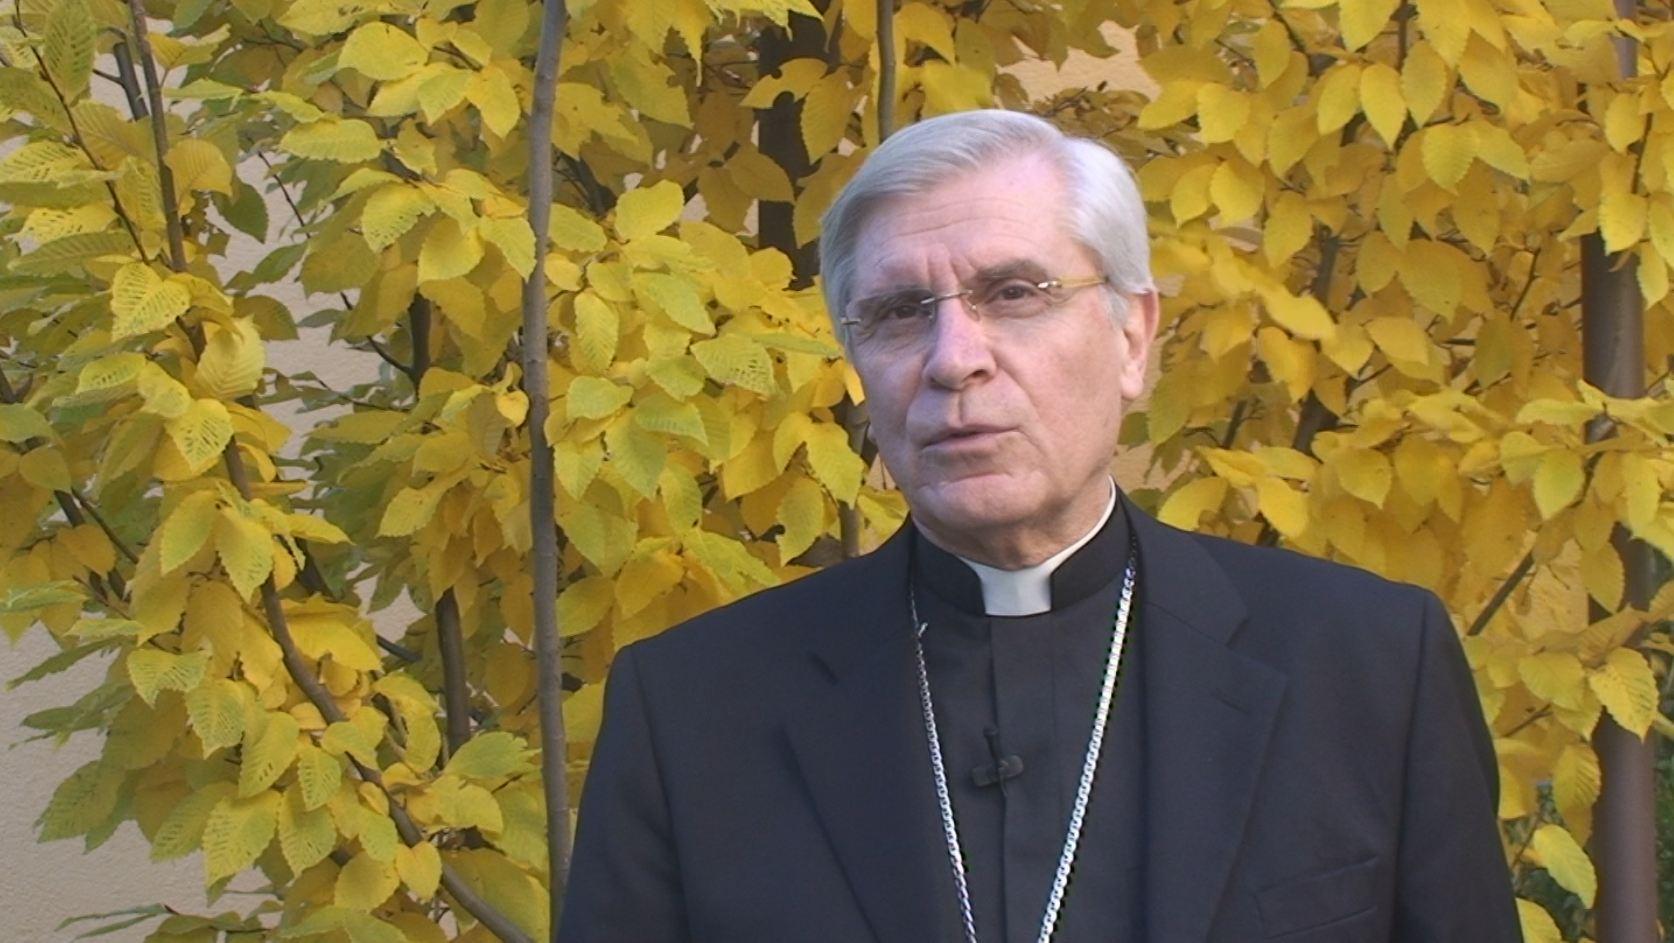 Chronique de Mgr Jean-Michel di Falco Léandri : le prix de l'homme